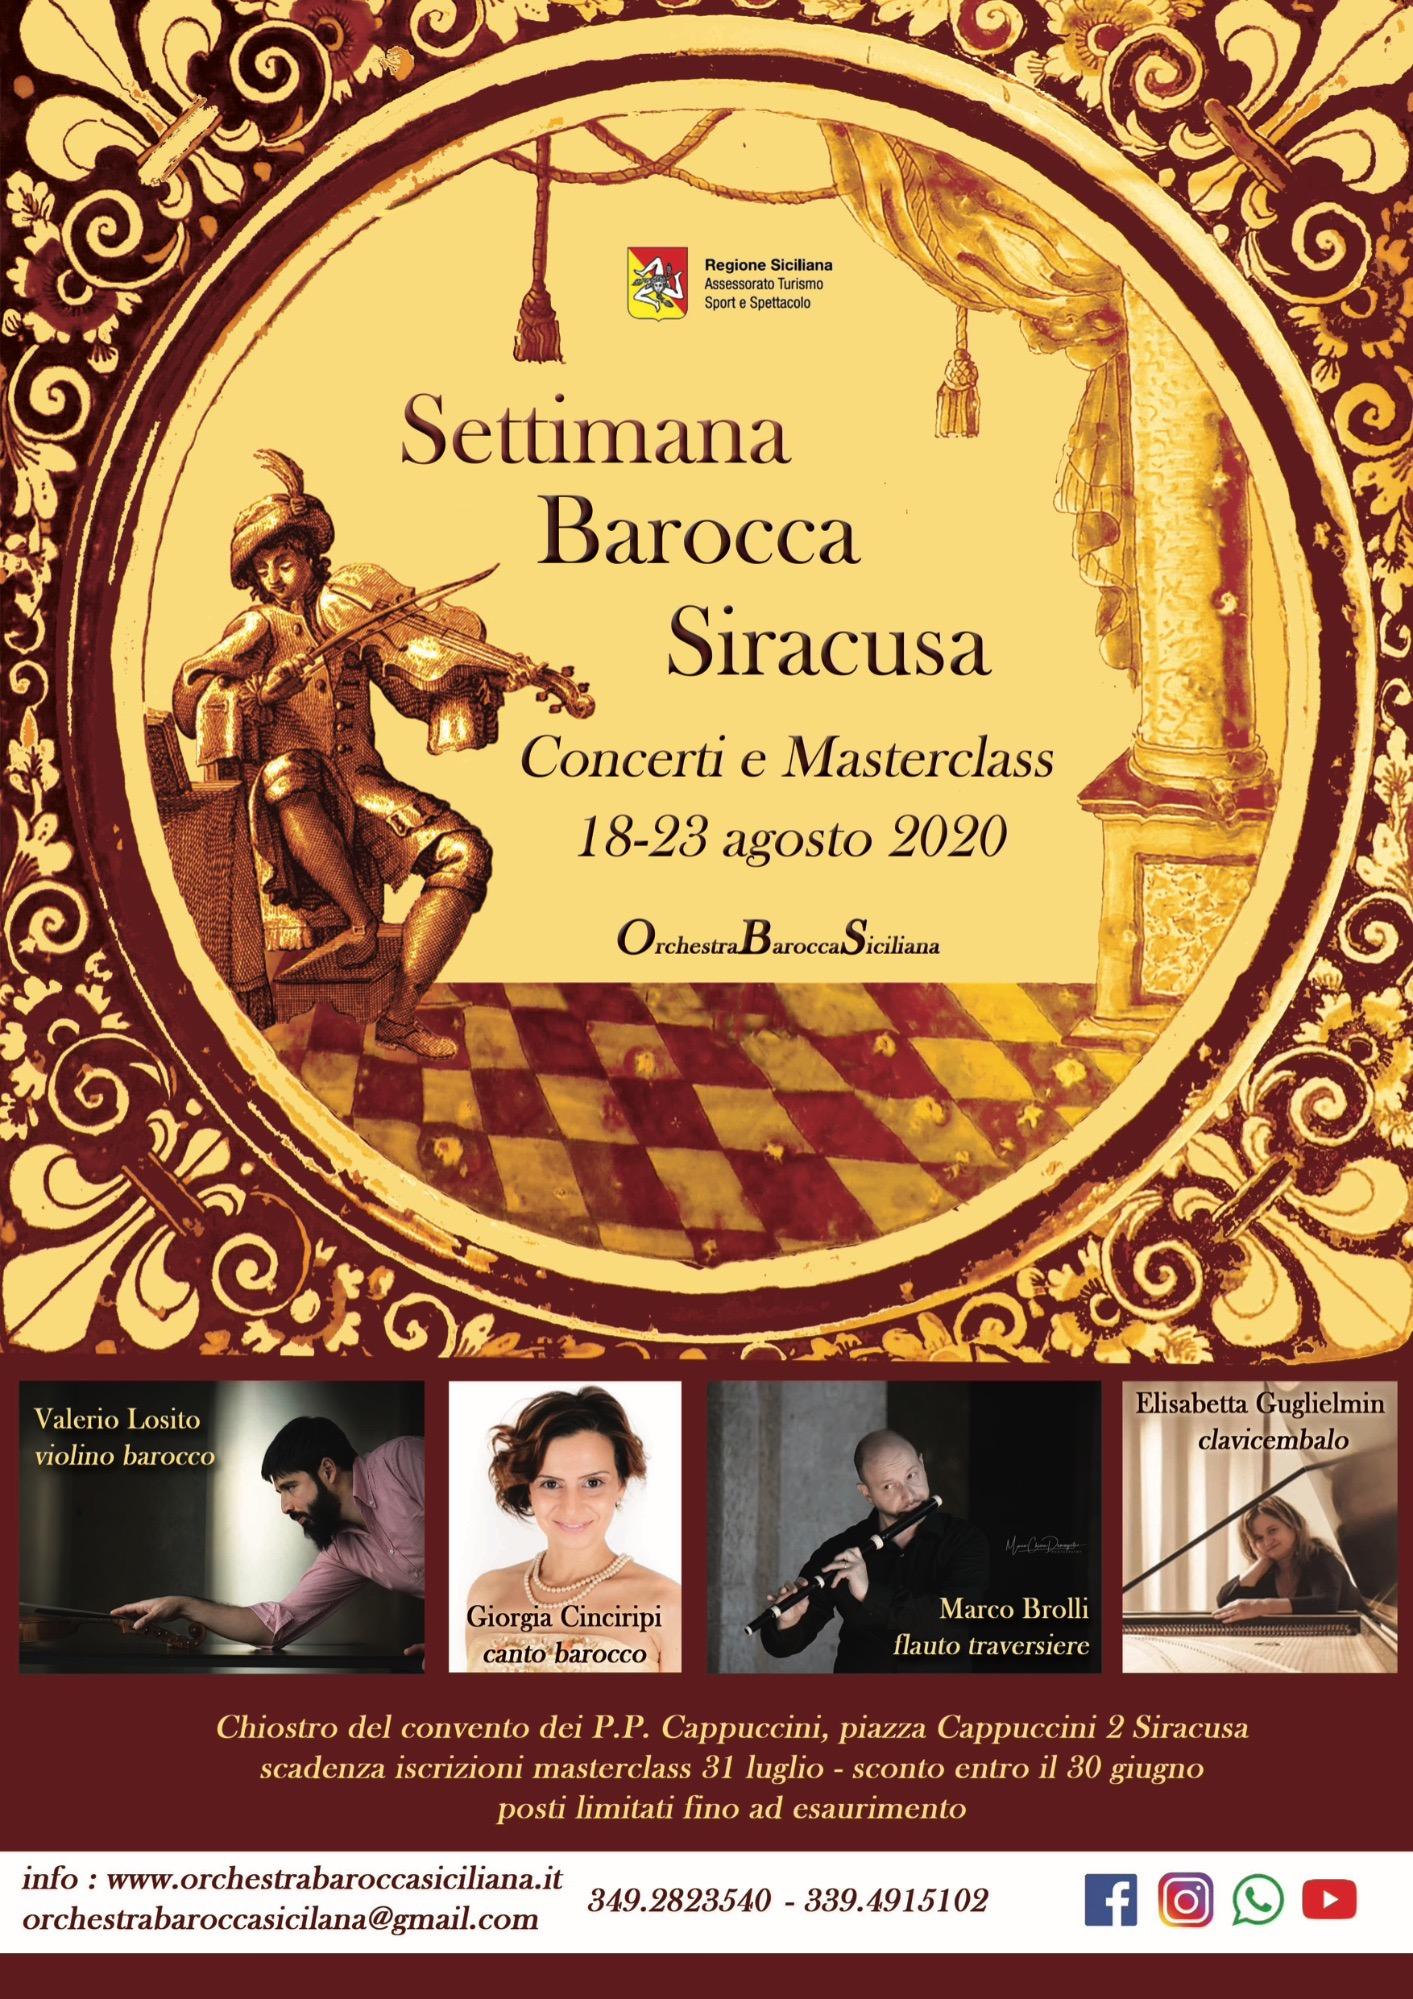 masterclasssiracusabarocca-1597313155.jpg